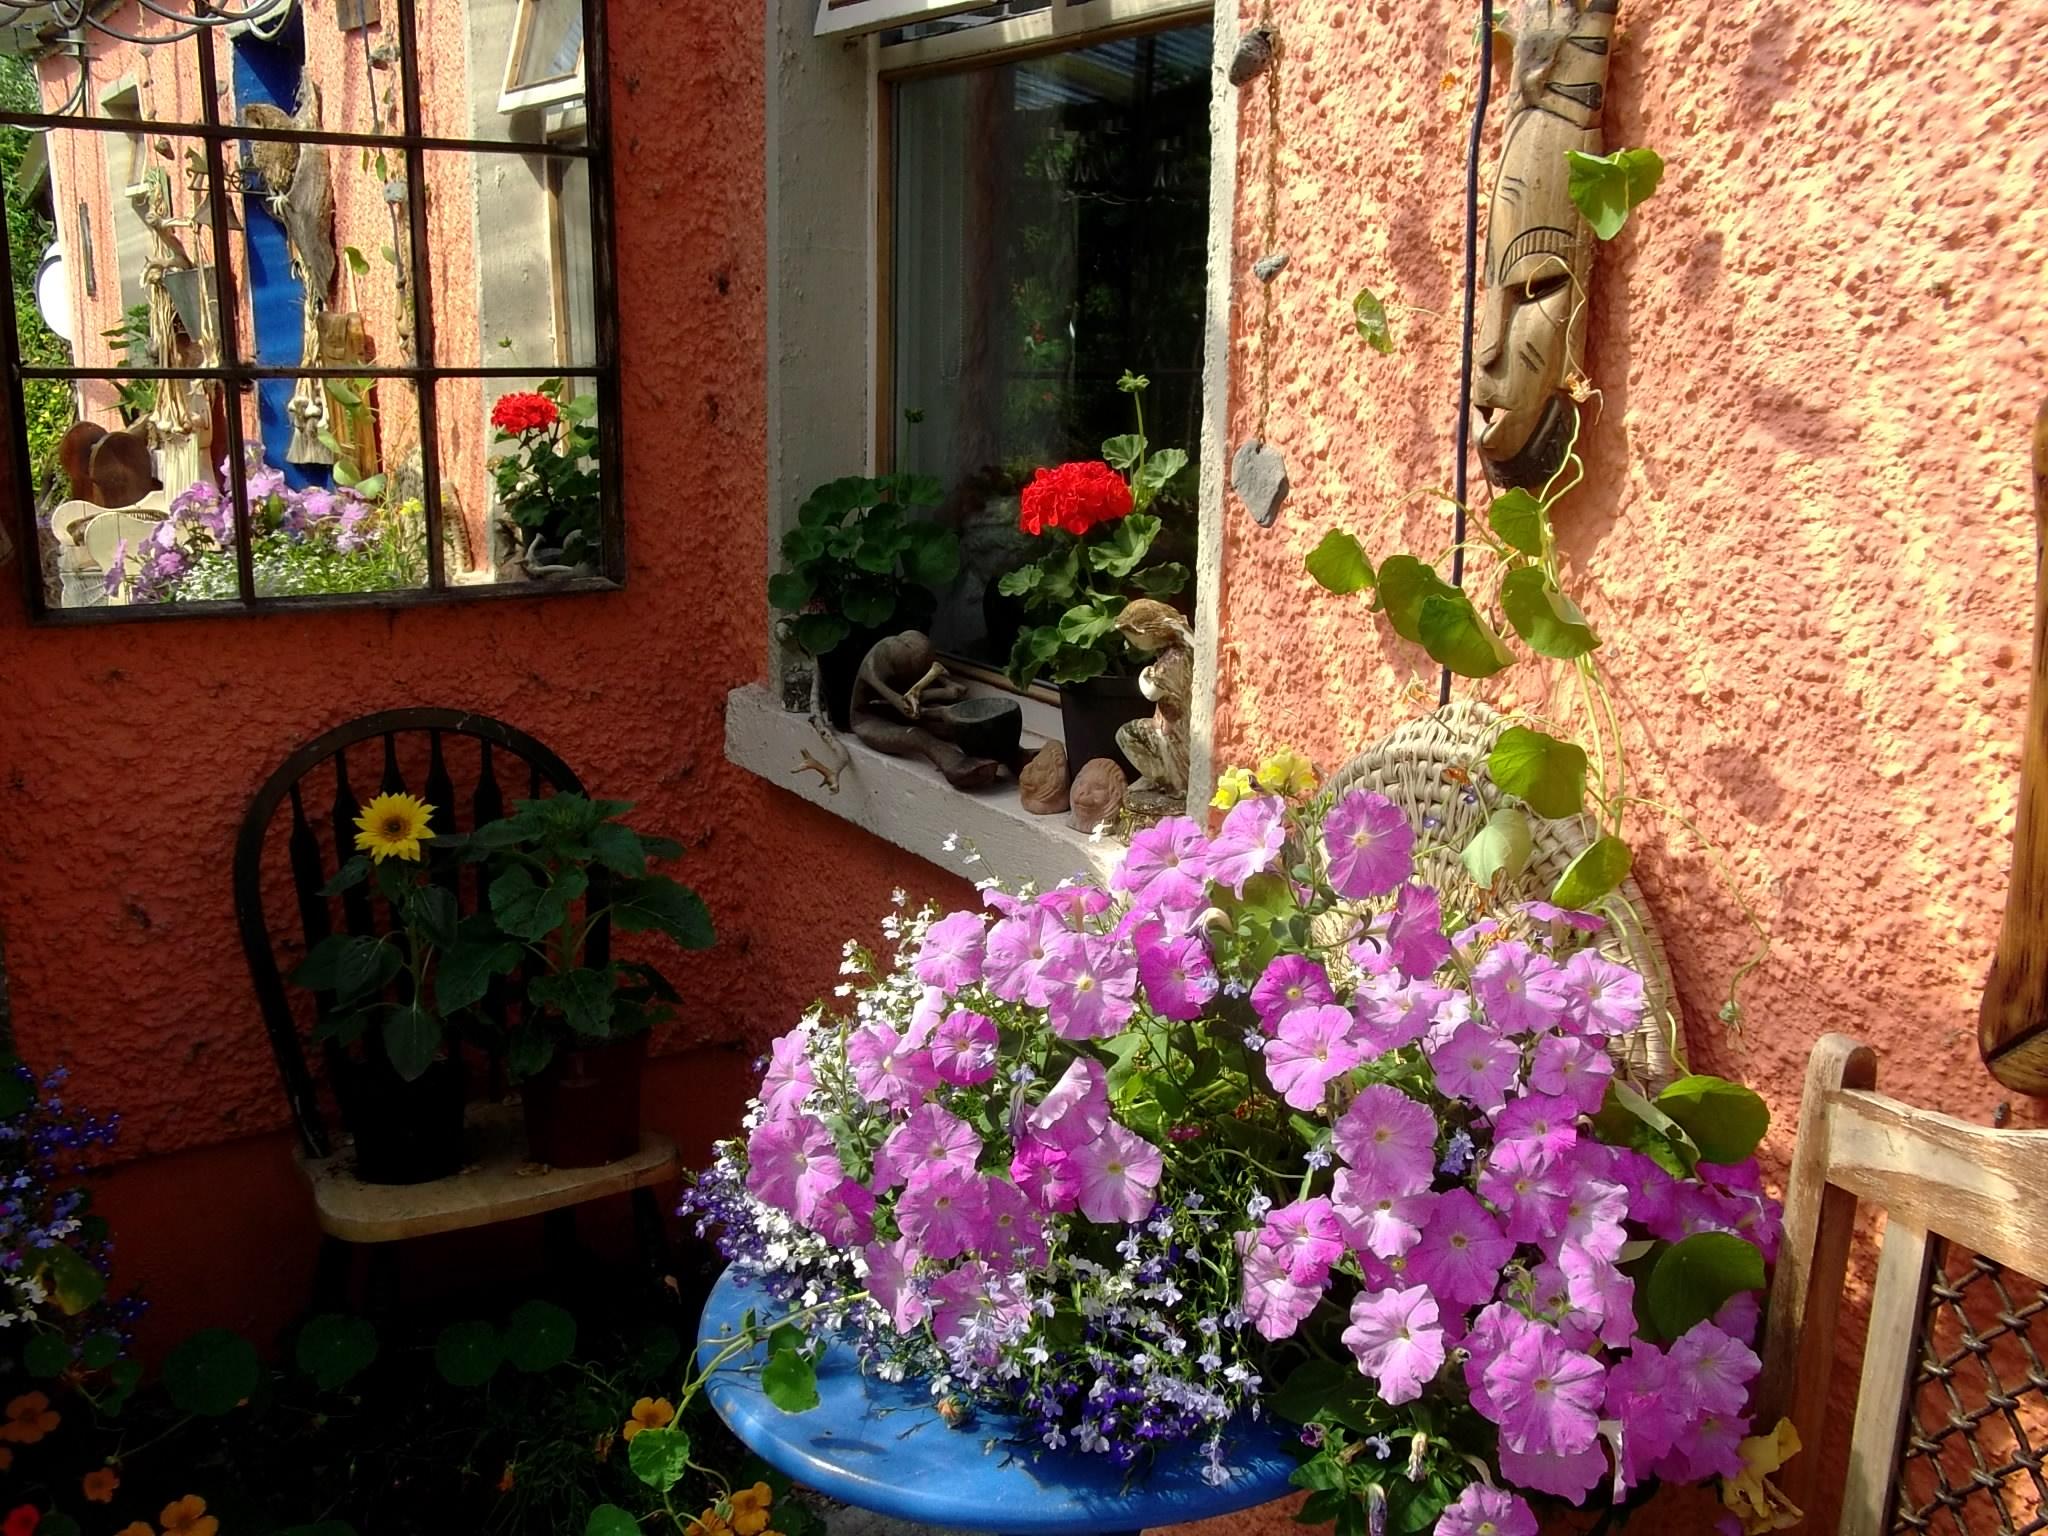 Petunias in pot on veranda table